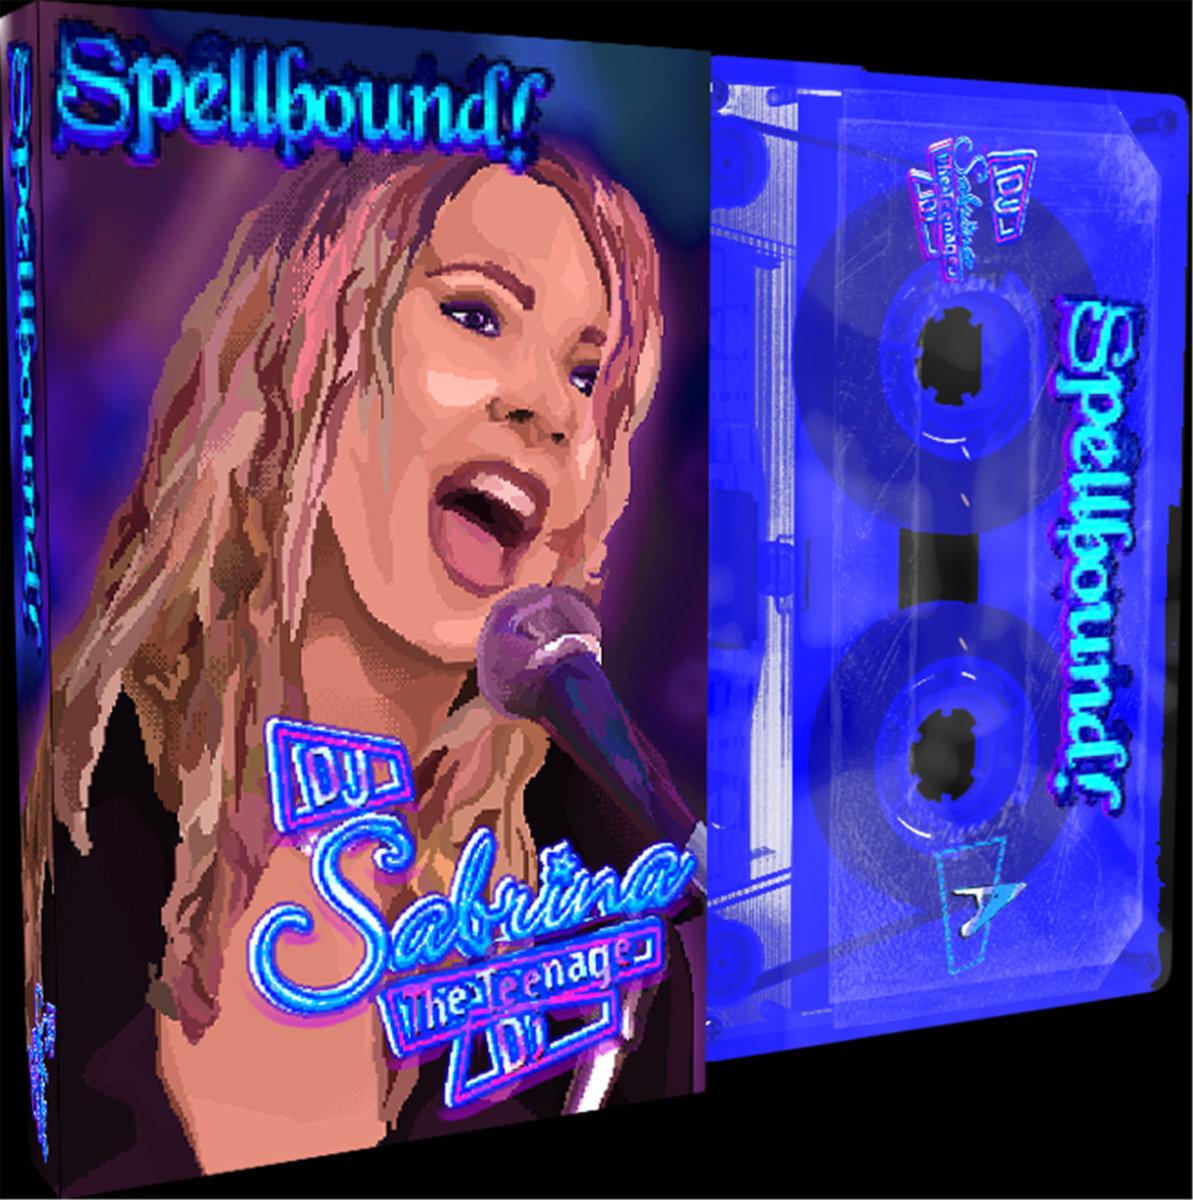 DJ Sabrina The Teenage DJ – Spellbound! (cassette)